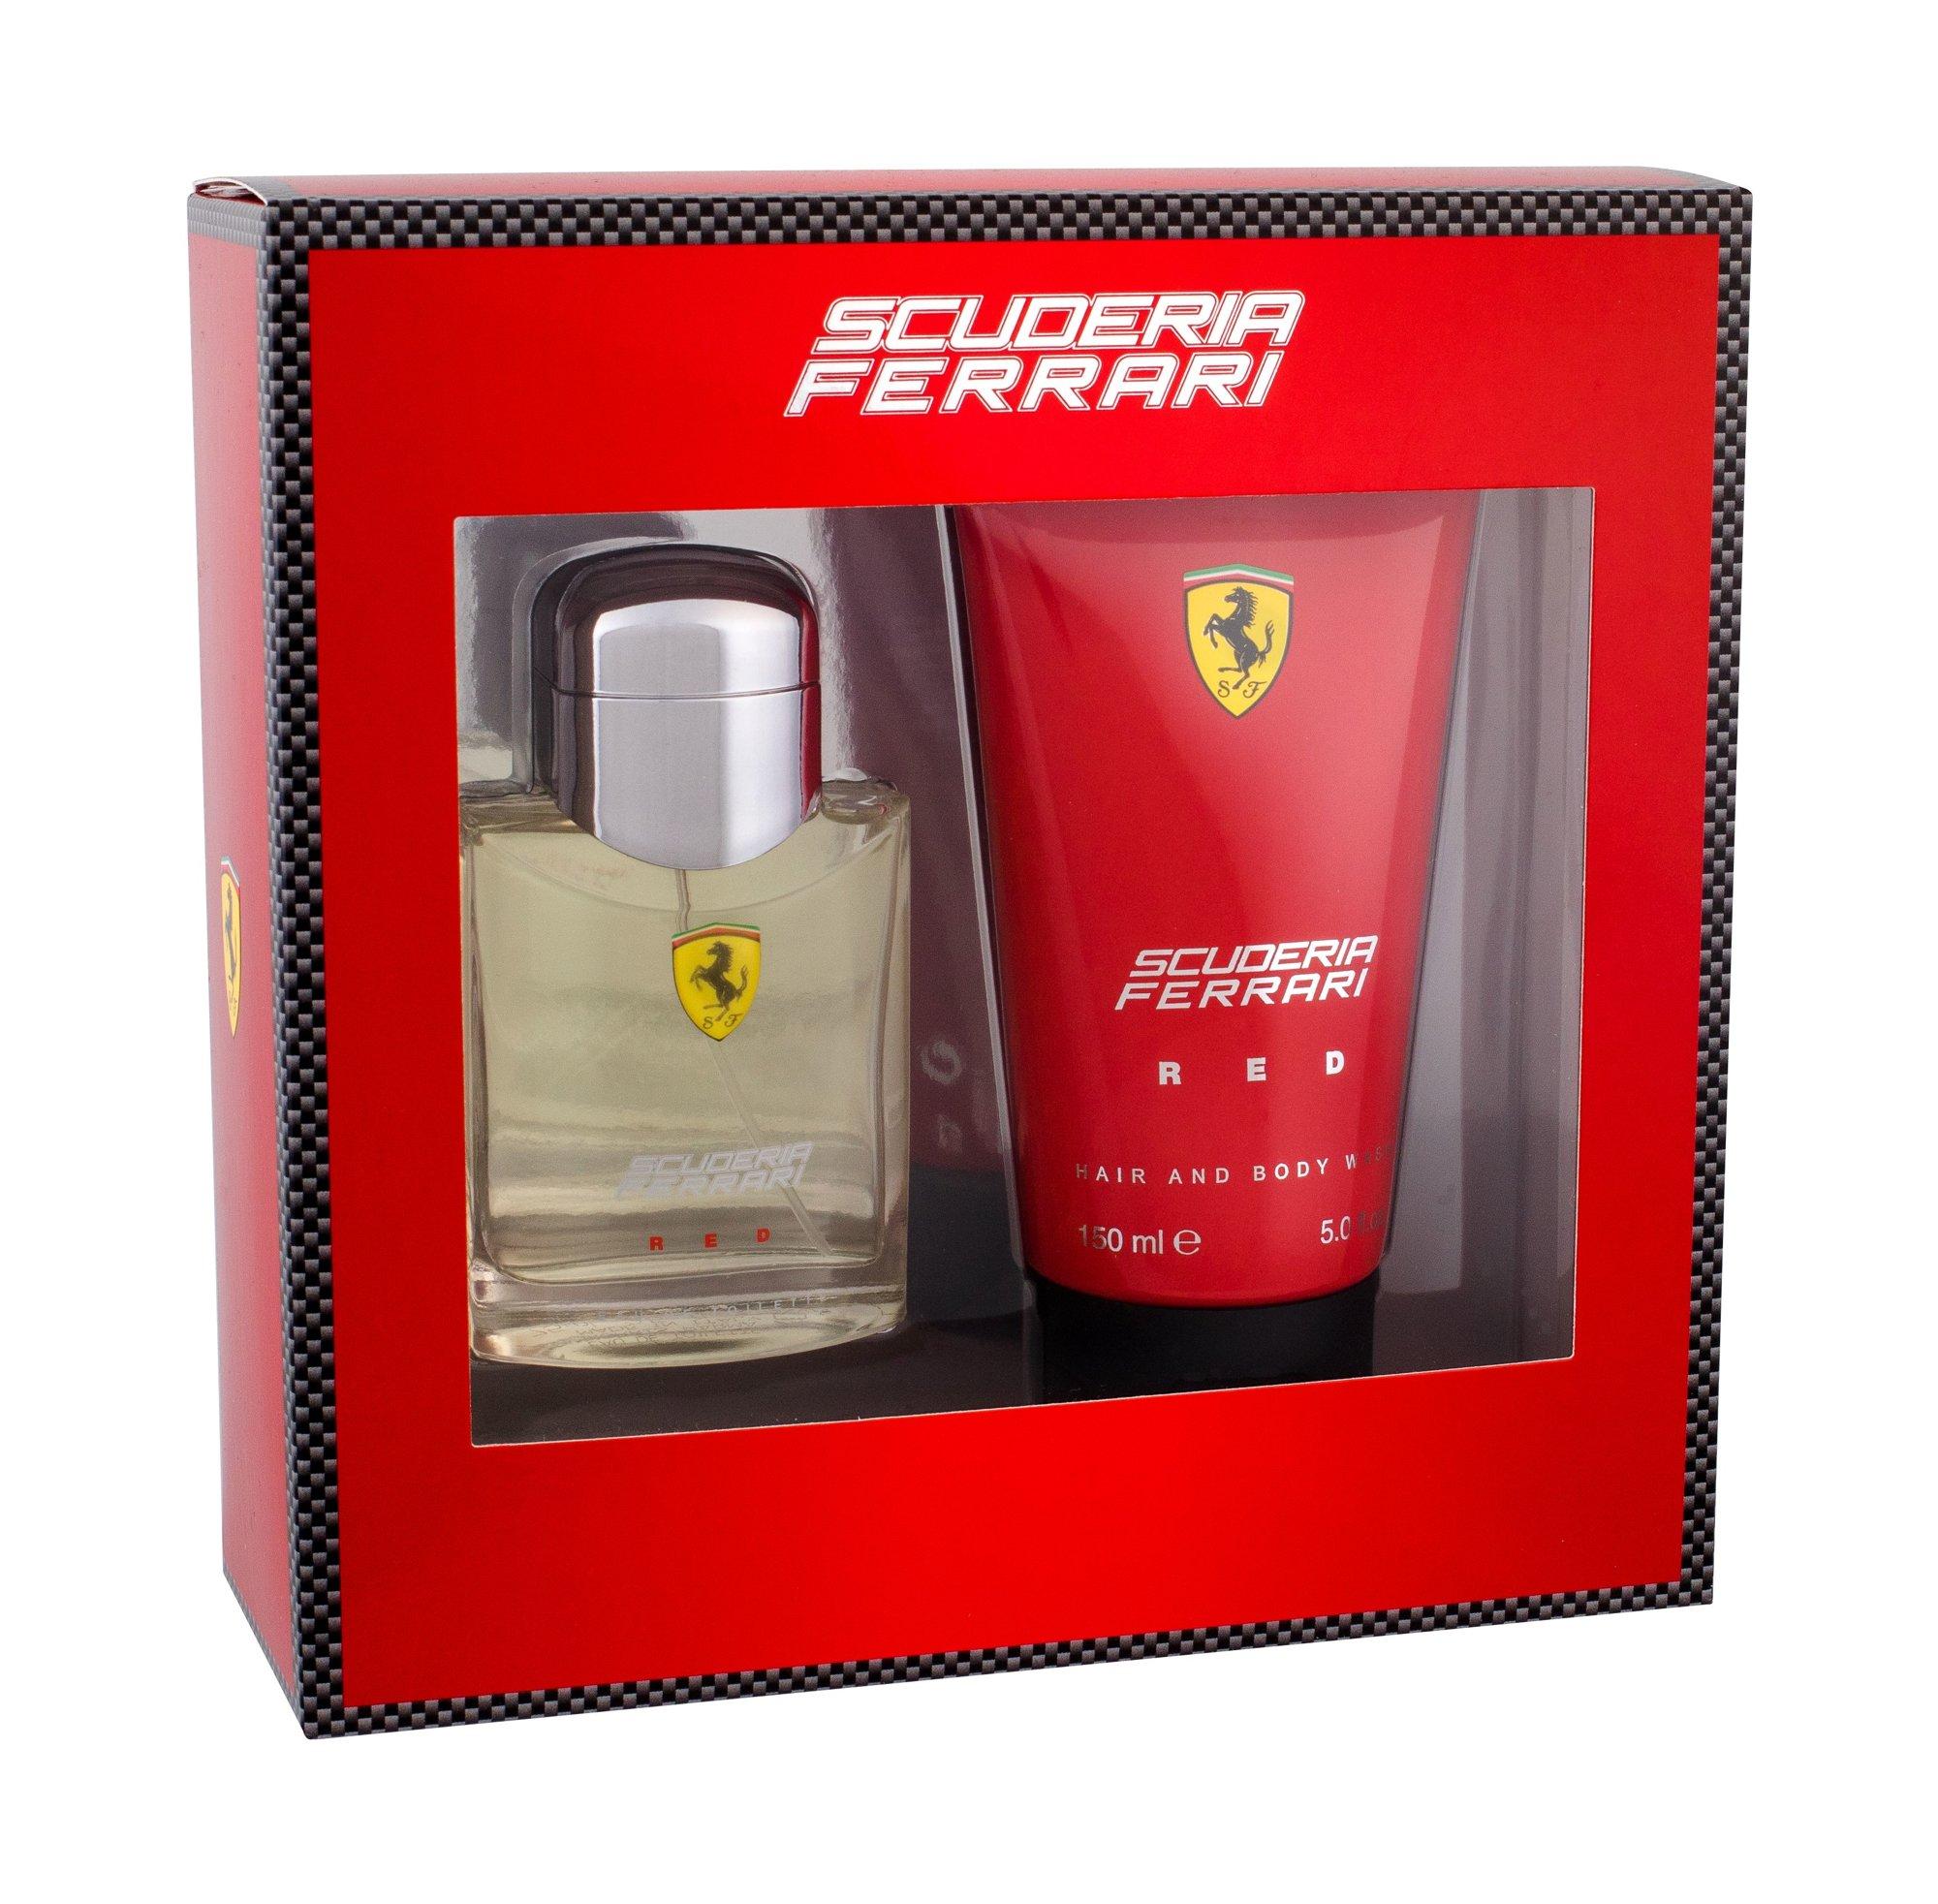 Ferrari Scuderia Ferrari Red EDT 75ml